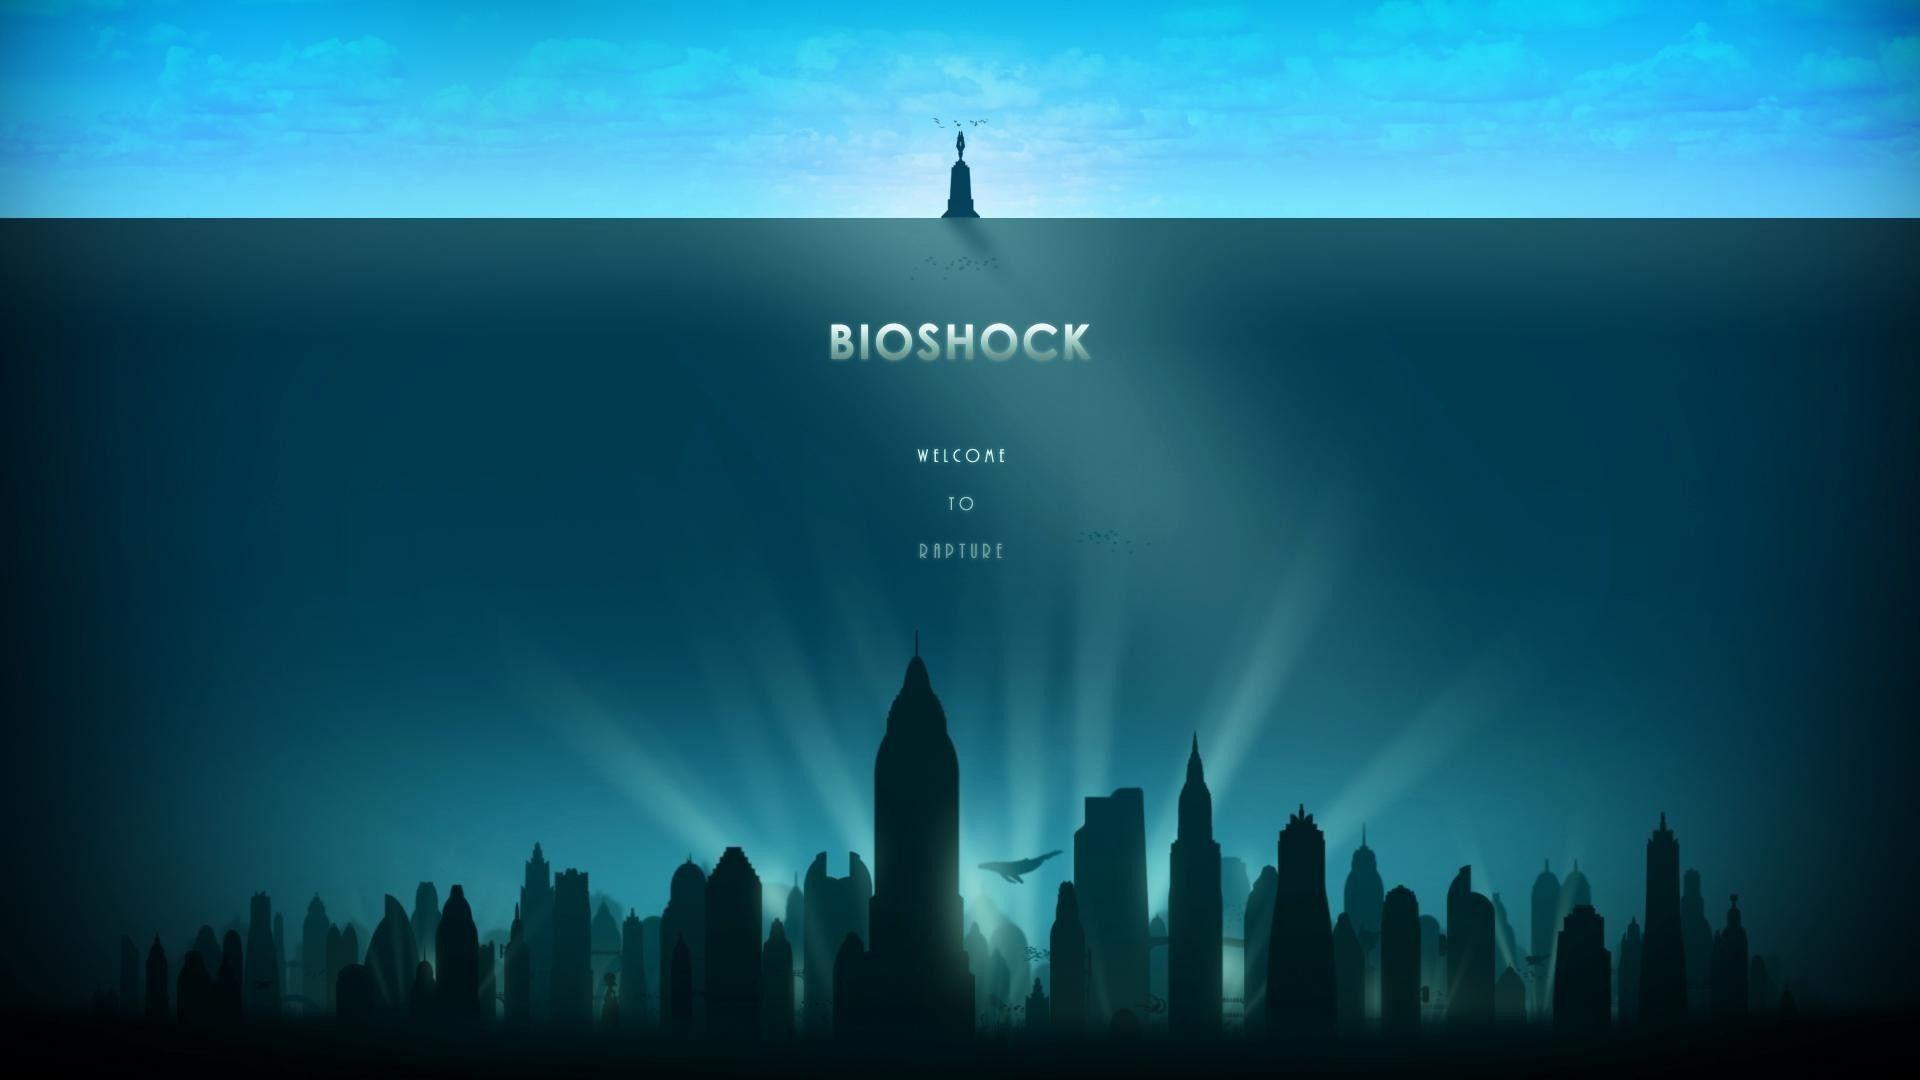 Bioshock Wallpaper 4k Bioshock Art Bioshock Bioshock Rapture